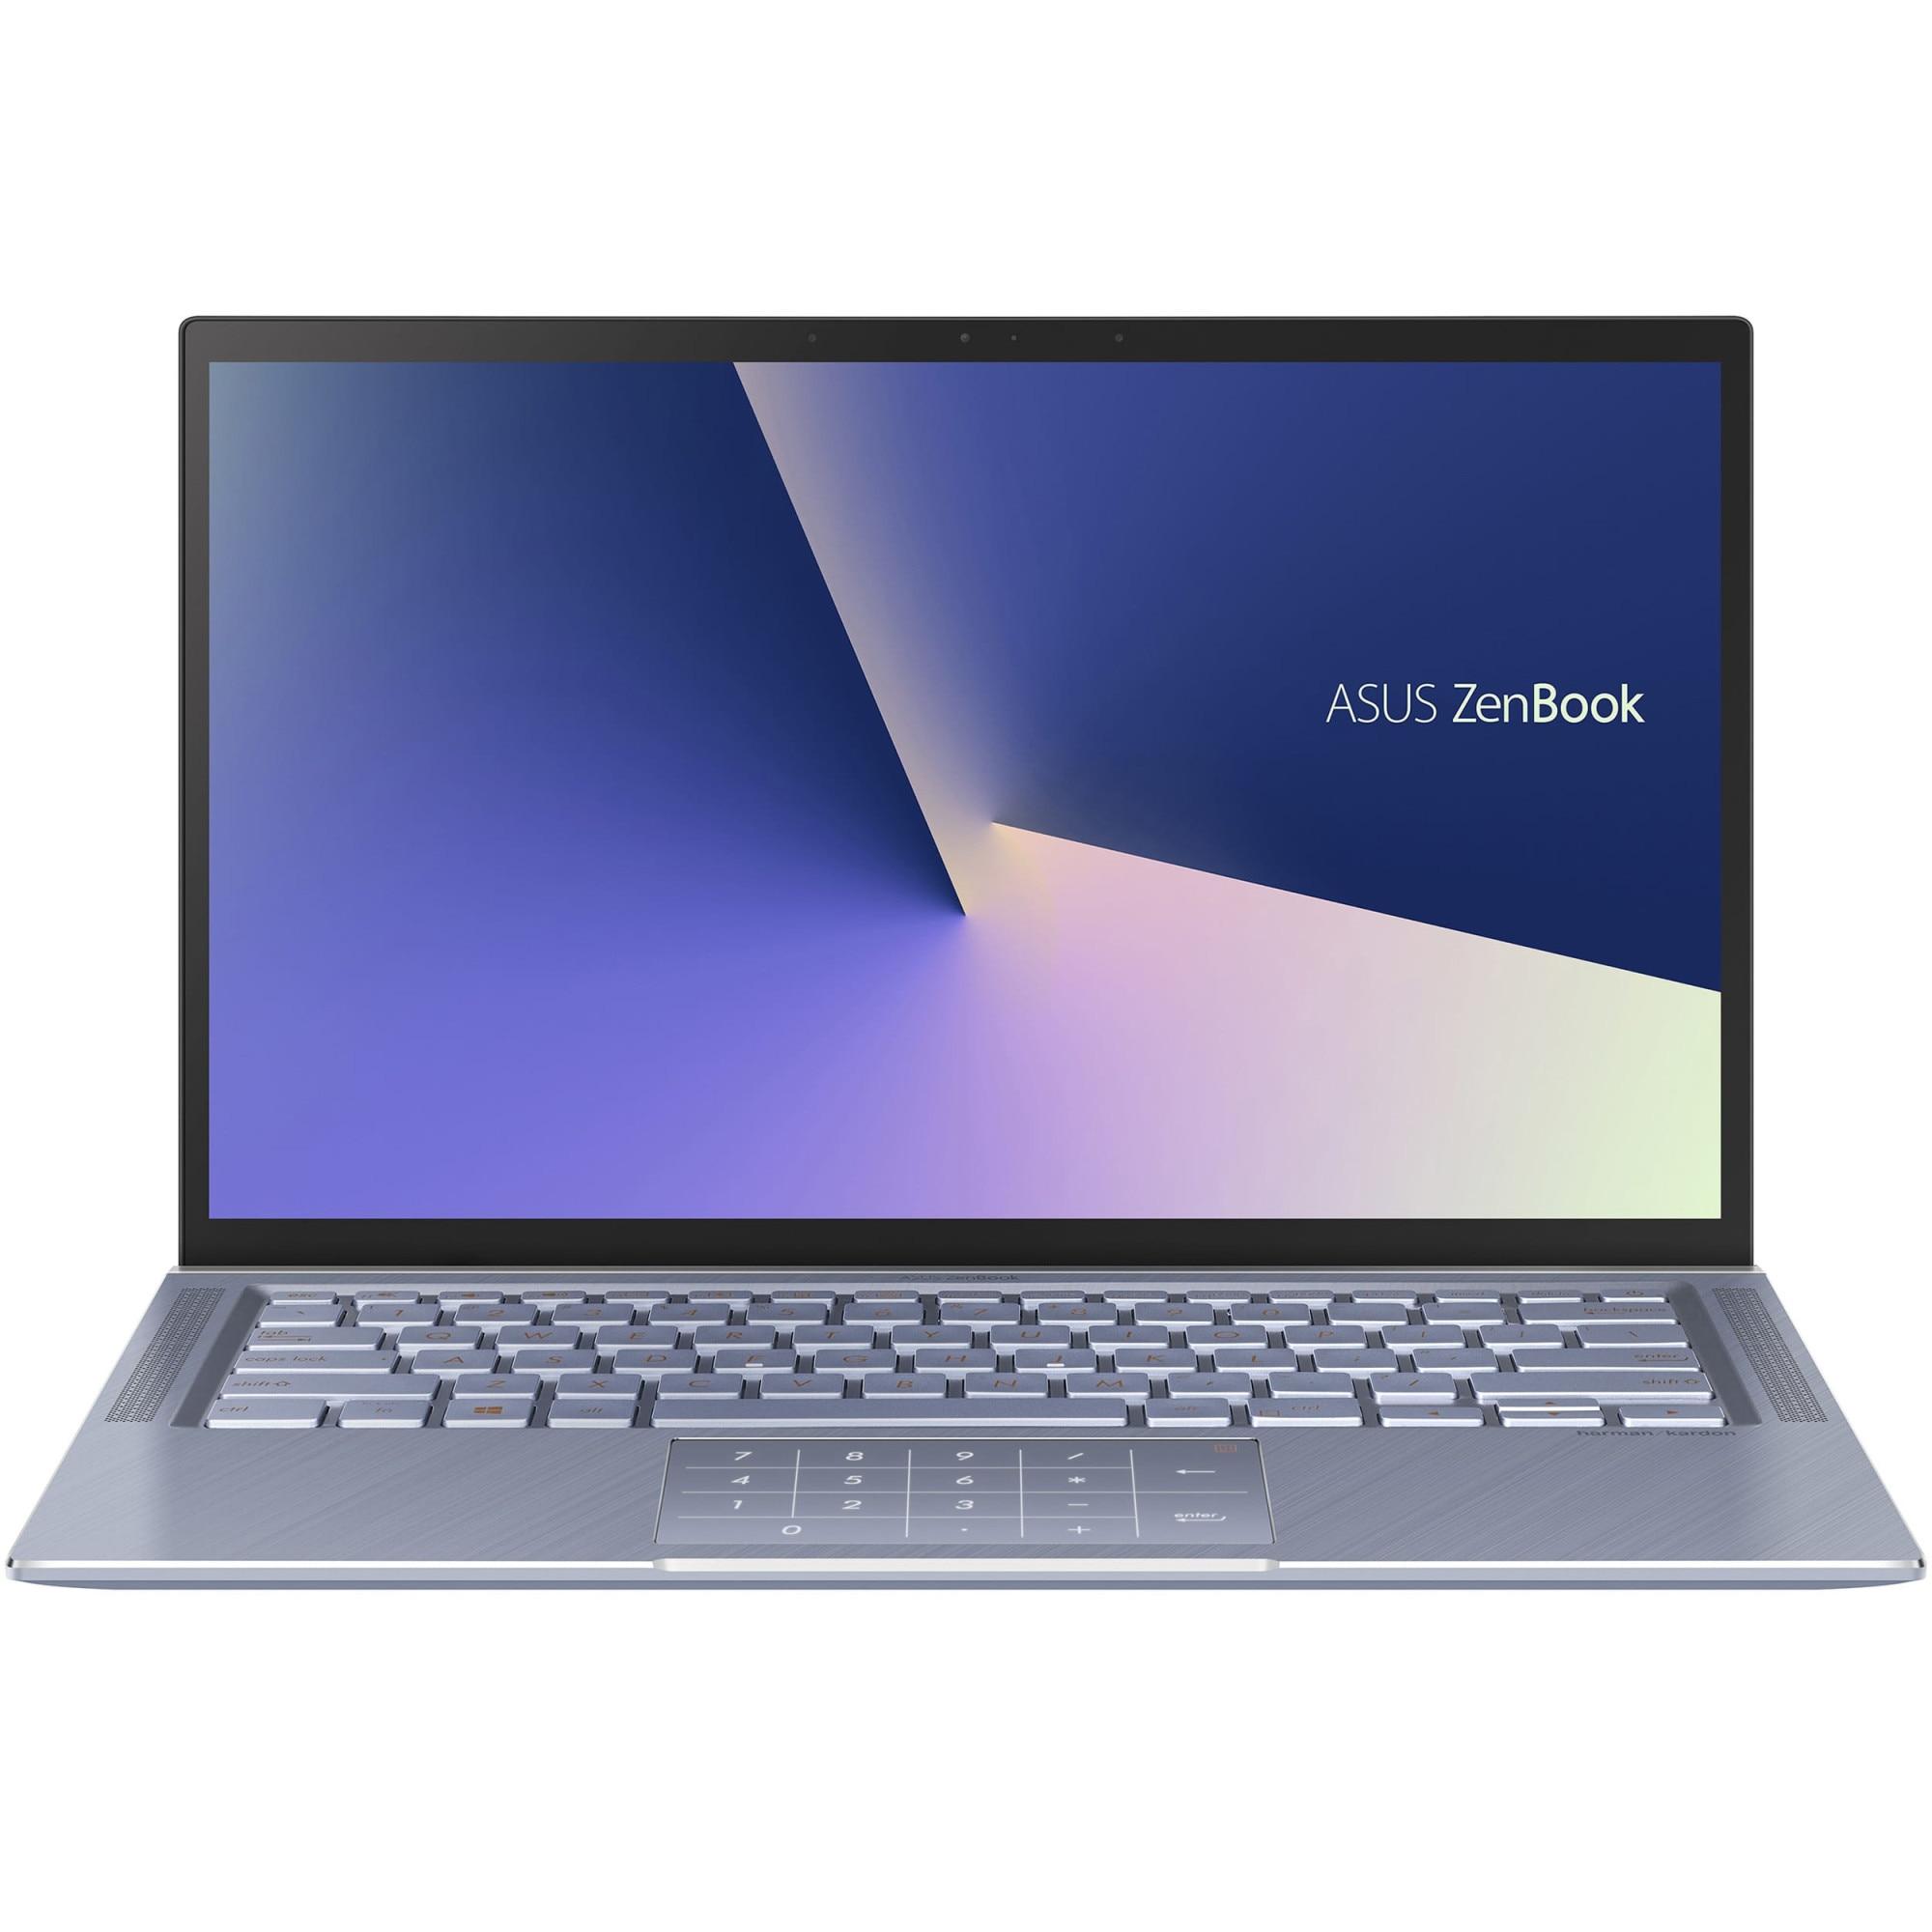 "Fotografie Laptop ultraportabil ASUS UX431FA cu procesor Intel® Core™ i7-8565U pana la 4.60 GHz Whiskey Lake, 14"", Full HD, 8GB, 256GB SSD, Intel® UHD Graphics 620, Endless OS, Utopia Blue Metal"